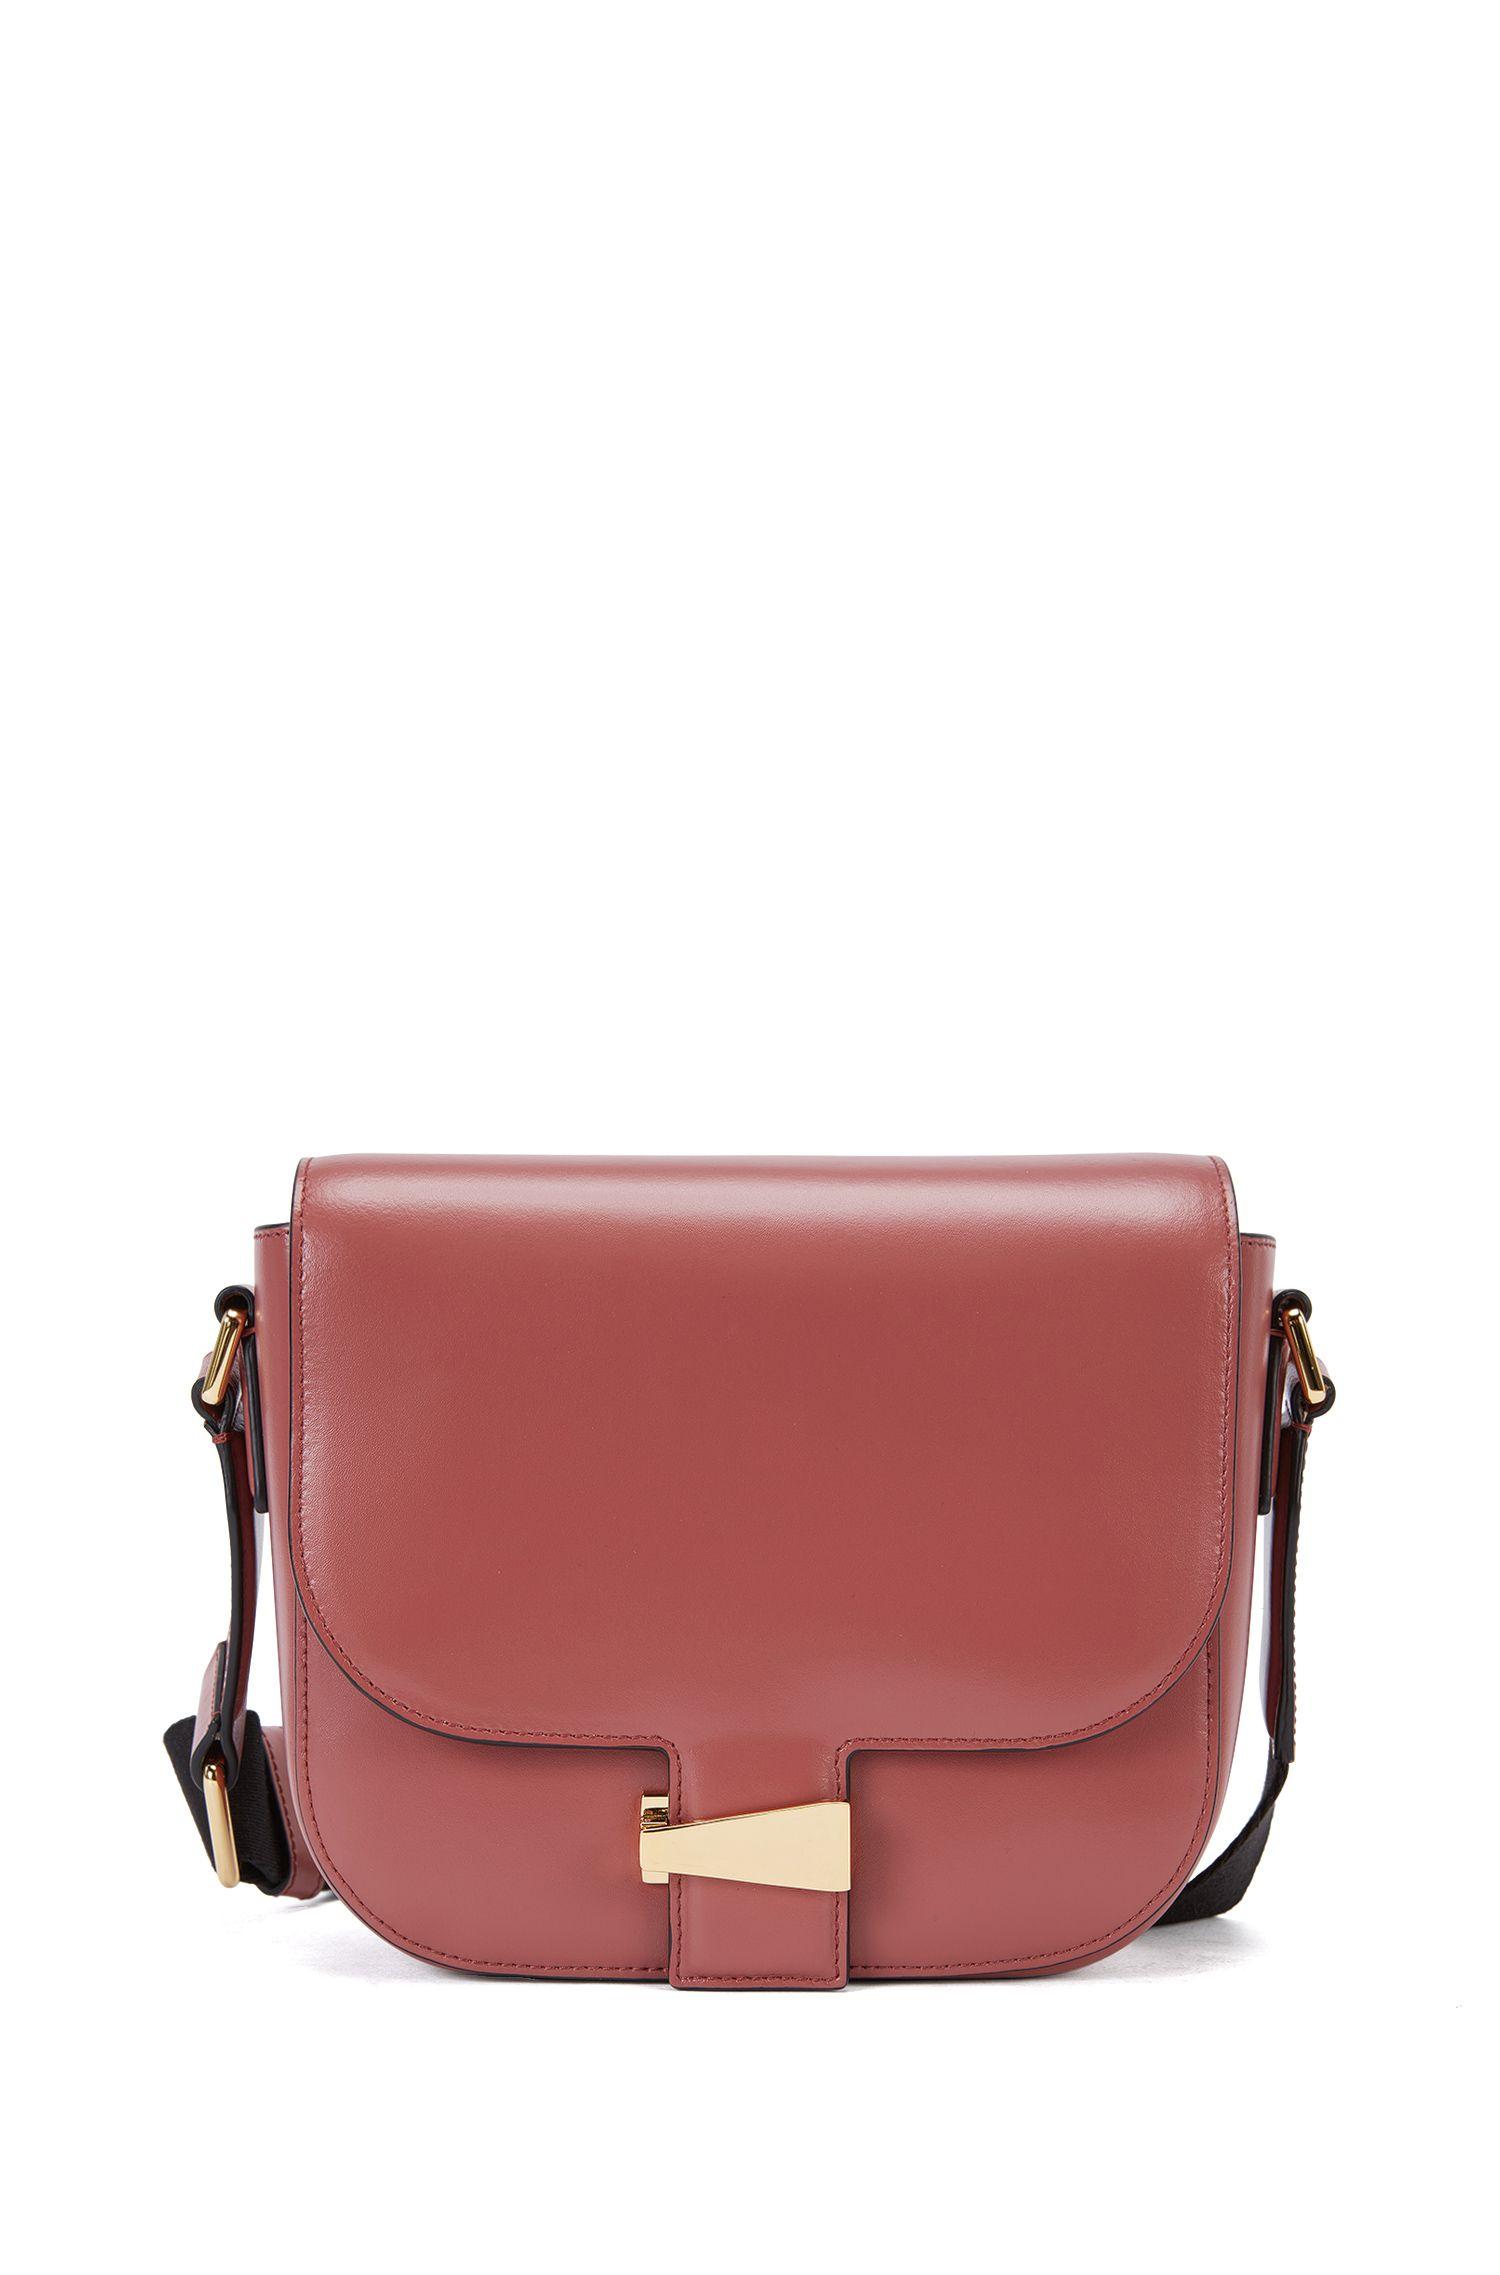 Leather shoulder bag with flap closure